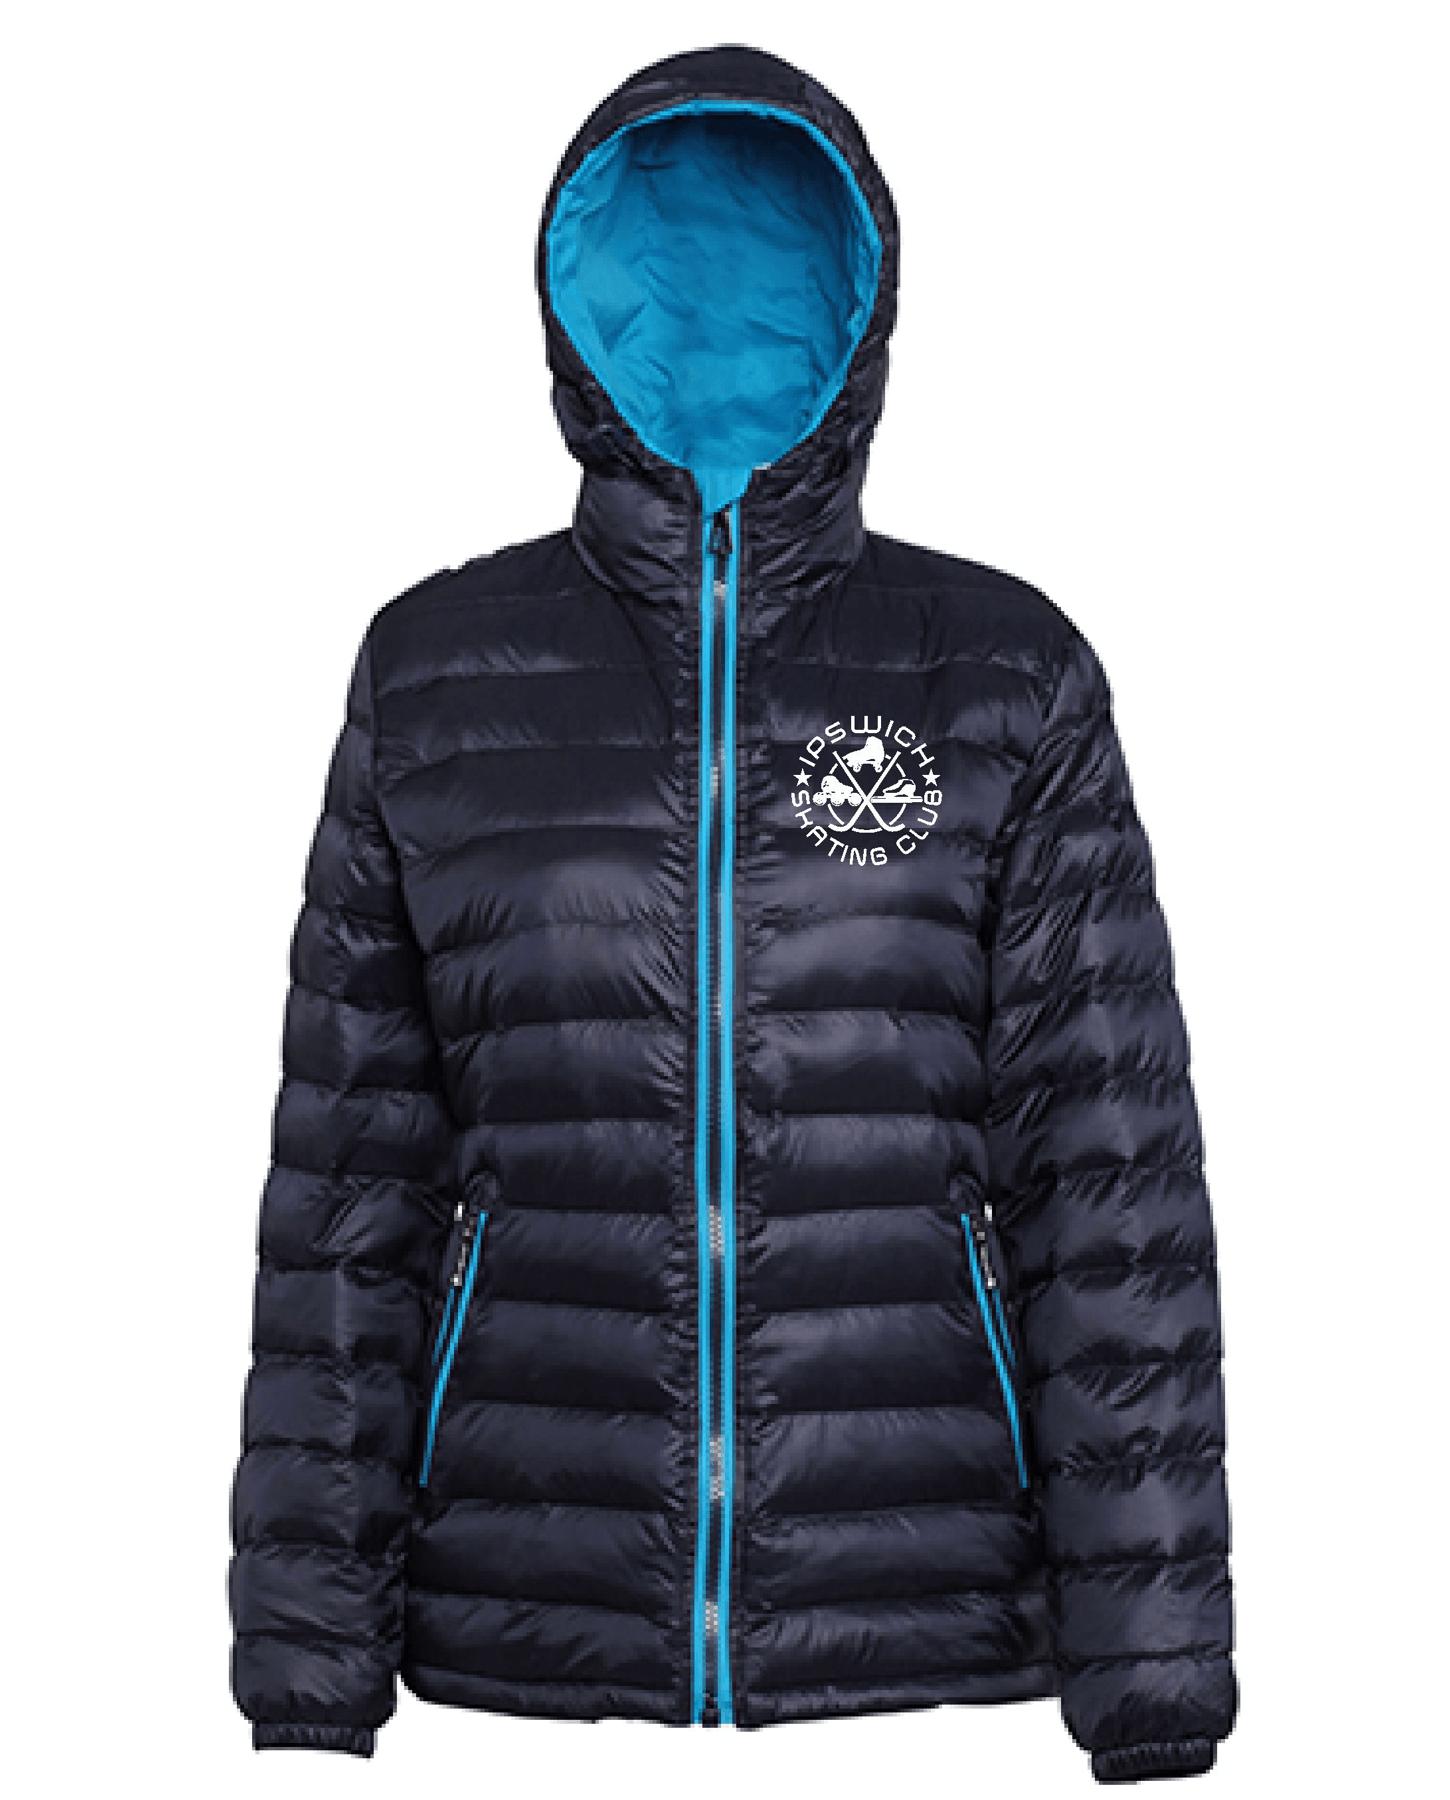 ISC – Padded Jacket (Ladies)